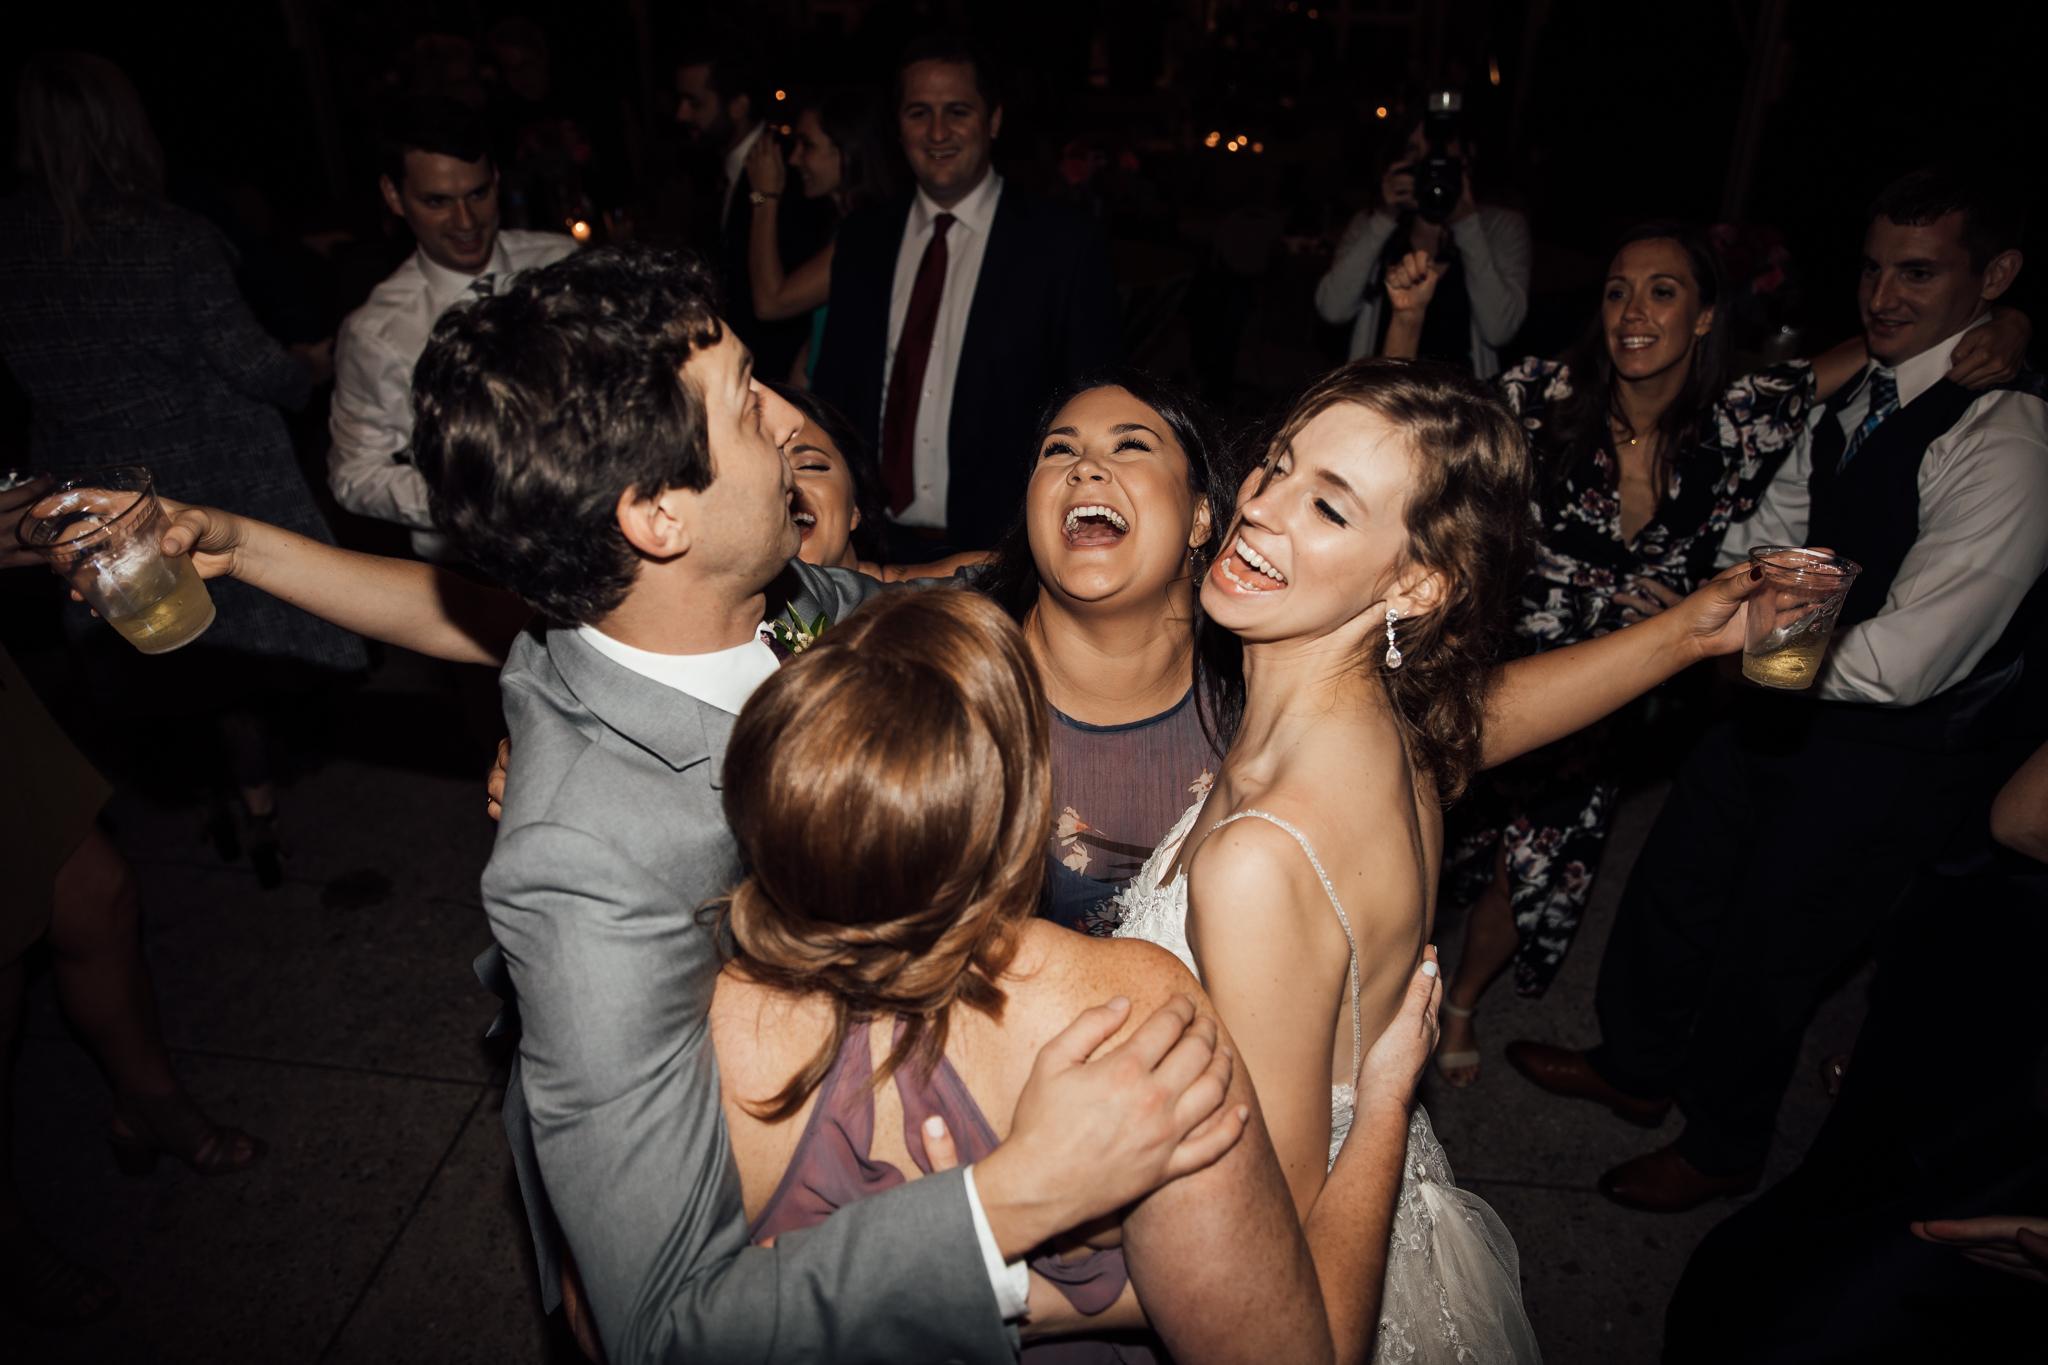 memphis-wedding-photographers-thewarmtharoundyou-dixon-wedding-rainy-wedding-adrianne-drew (13 of 13).jpg